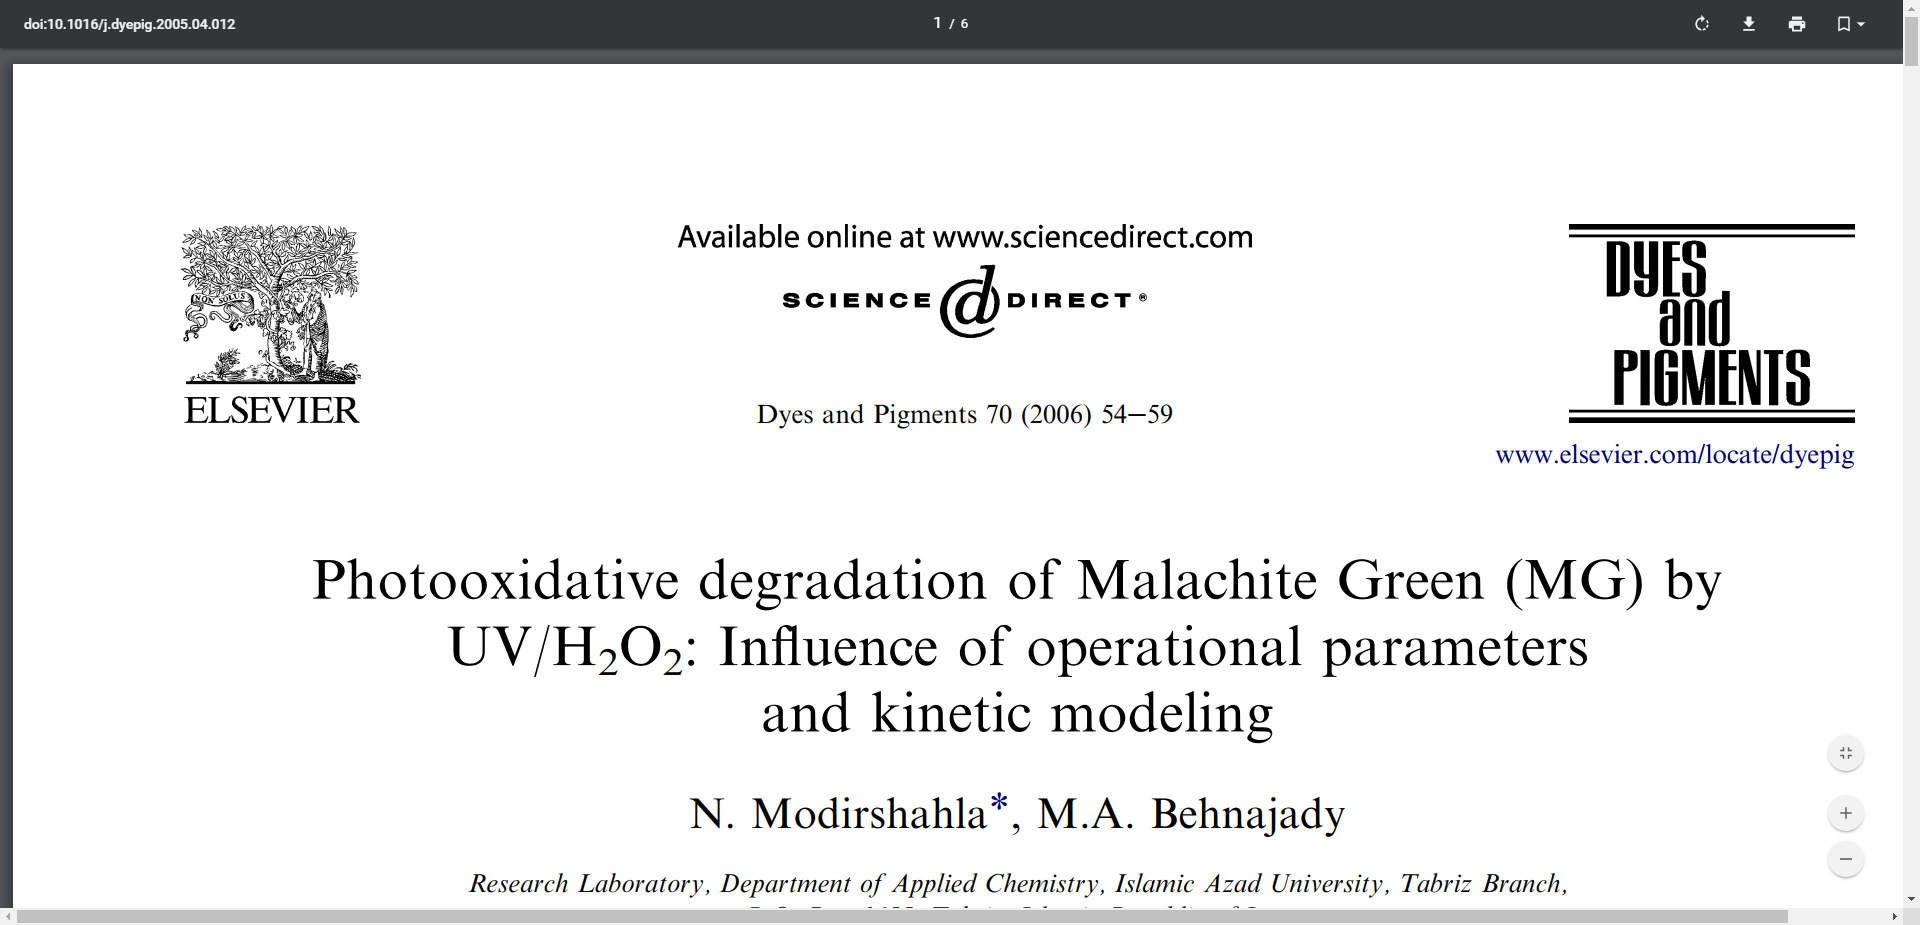 Photooxidative degradation of Malachite Green